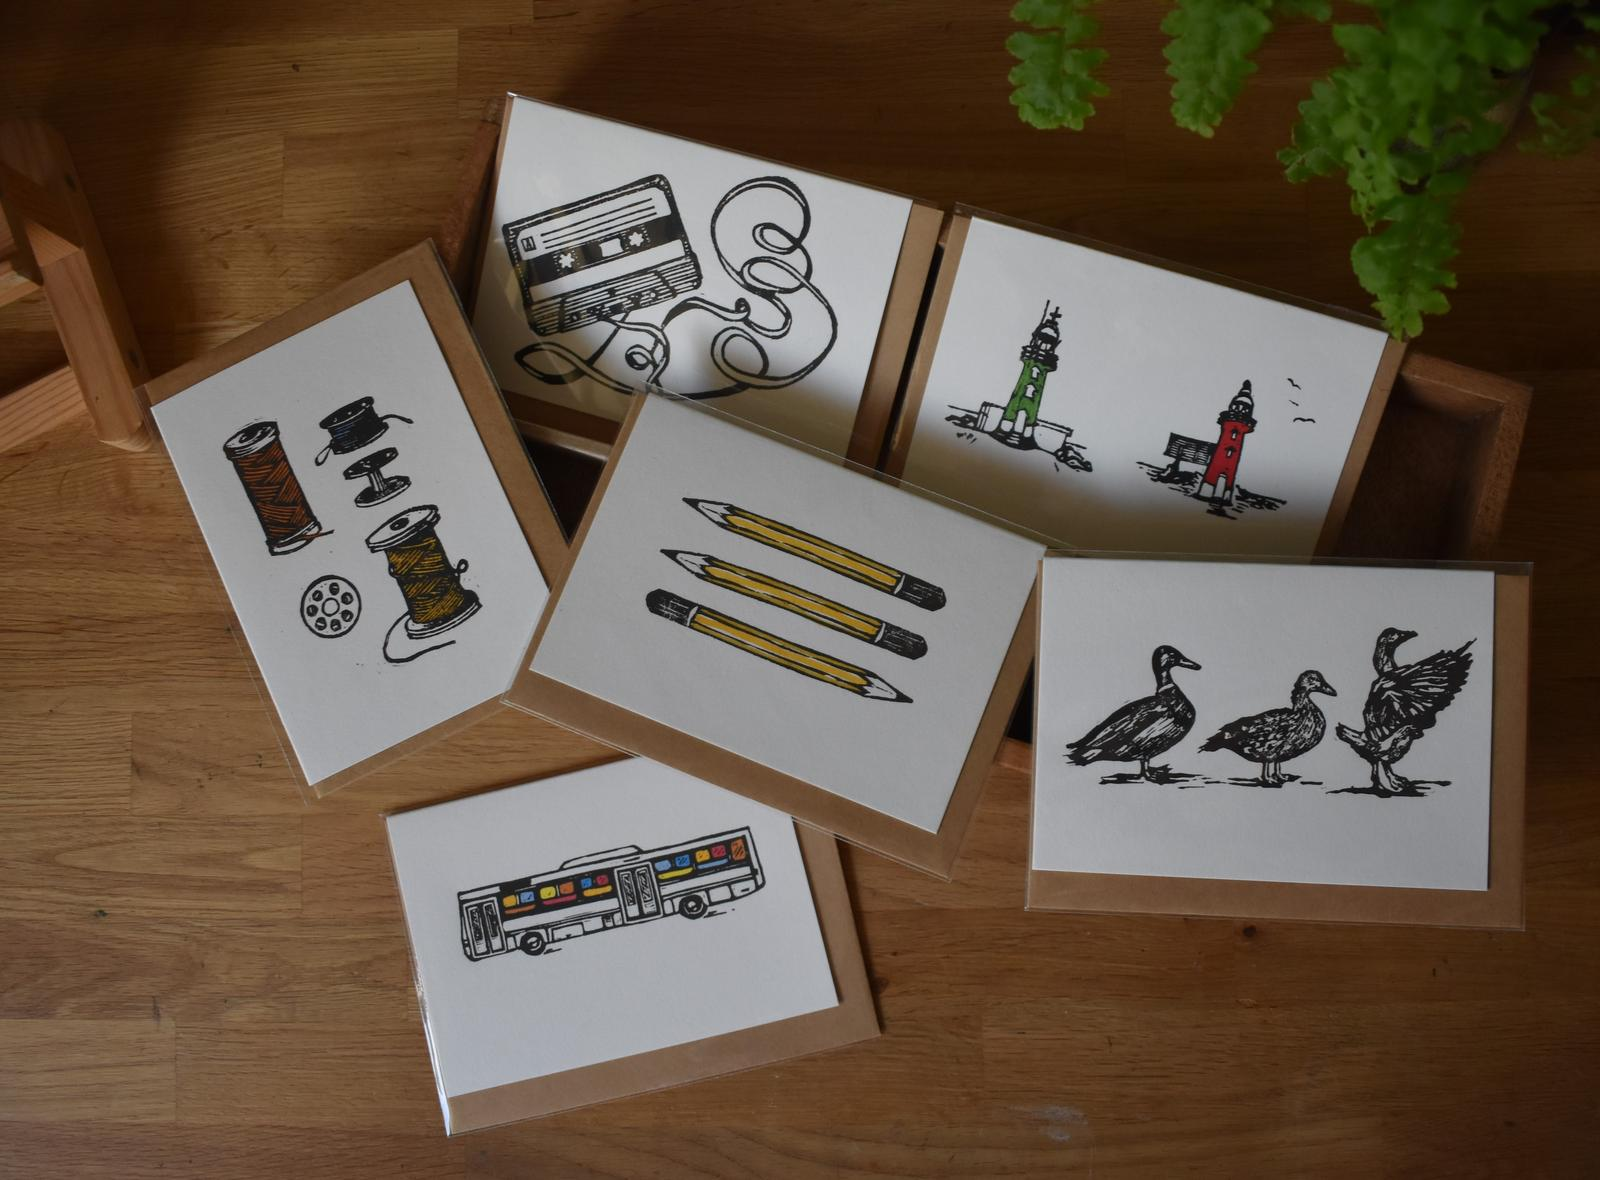 Handmade Relief Print Cards